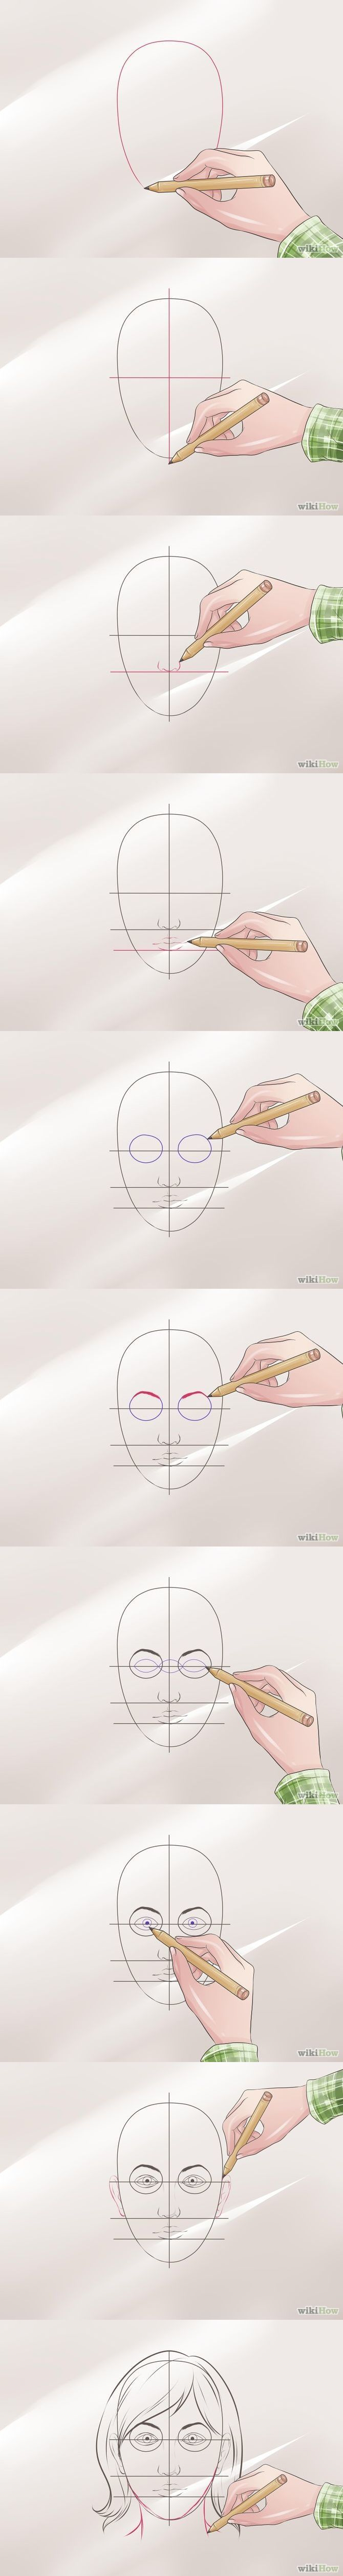 Teken gezicht